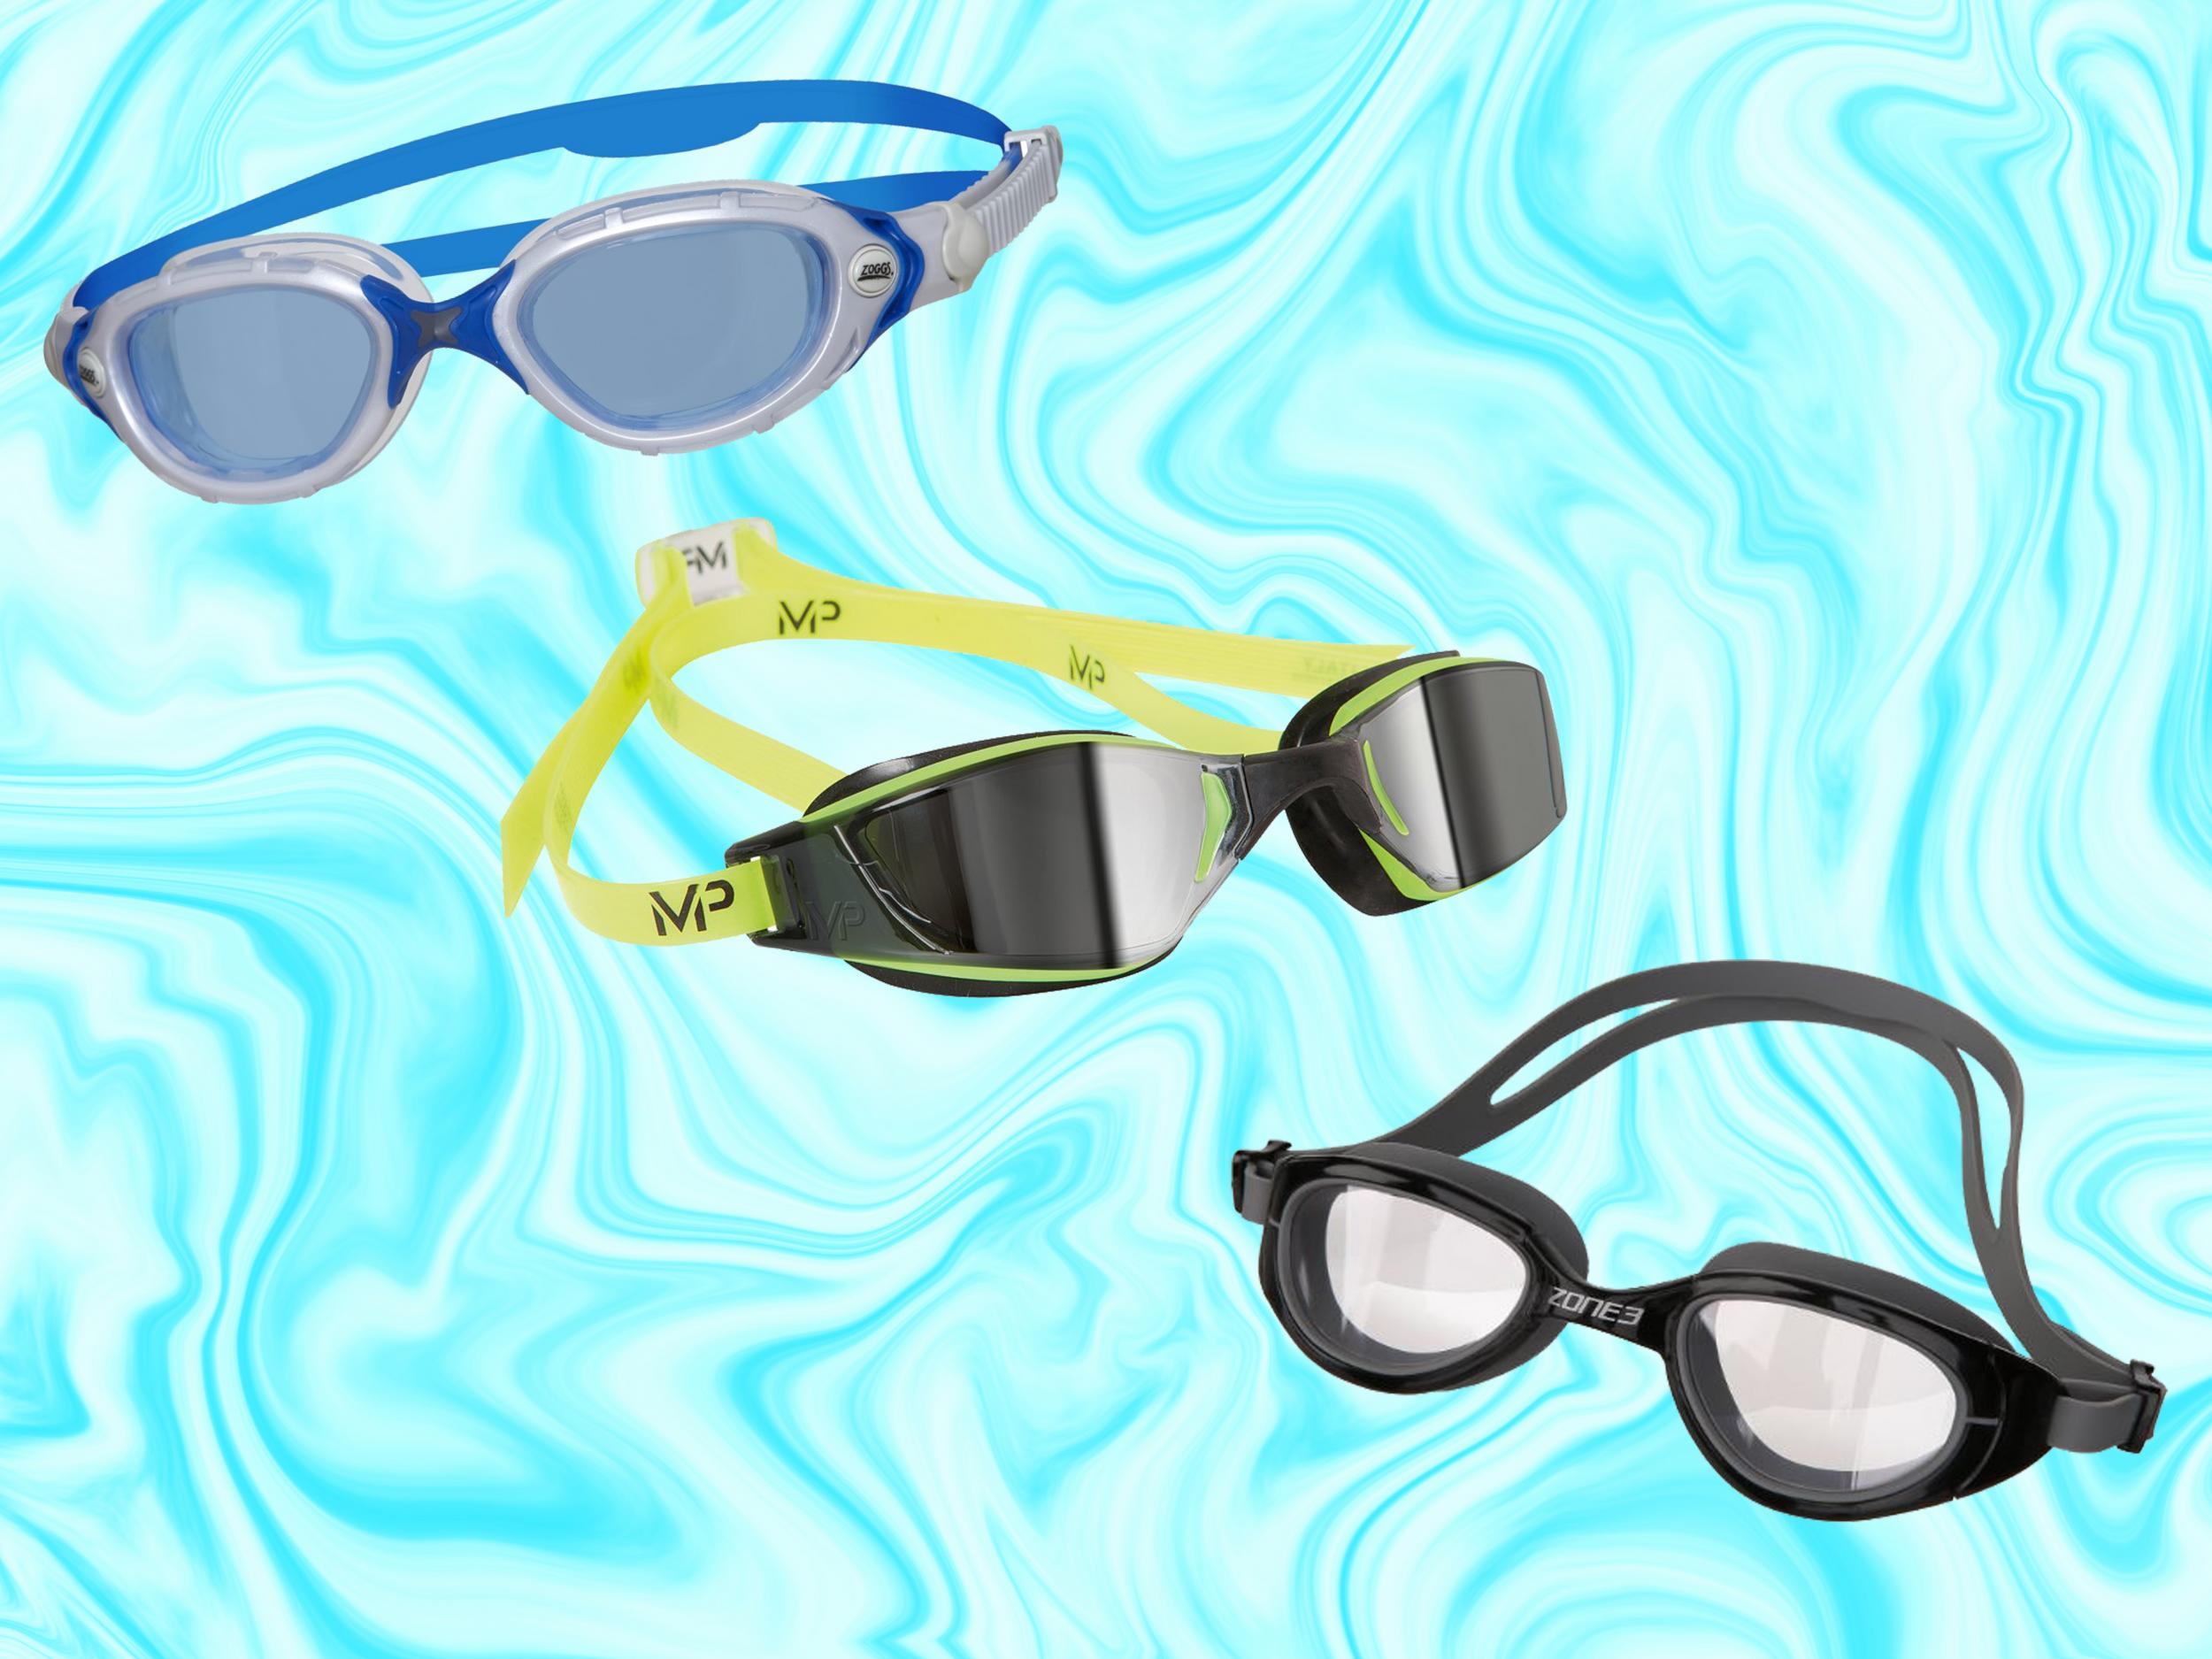 Original Waterproof Anti-fog Glasses Uv Protection Hd Swimming Goggles Eyewear 5 Color Bath Mirrors Bathroom Hardware